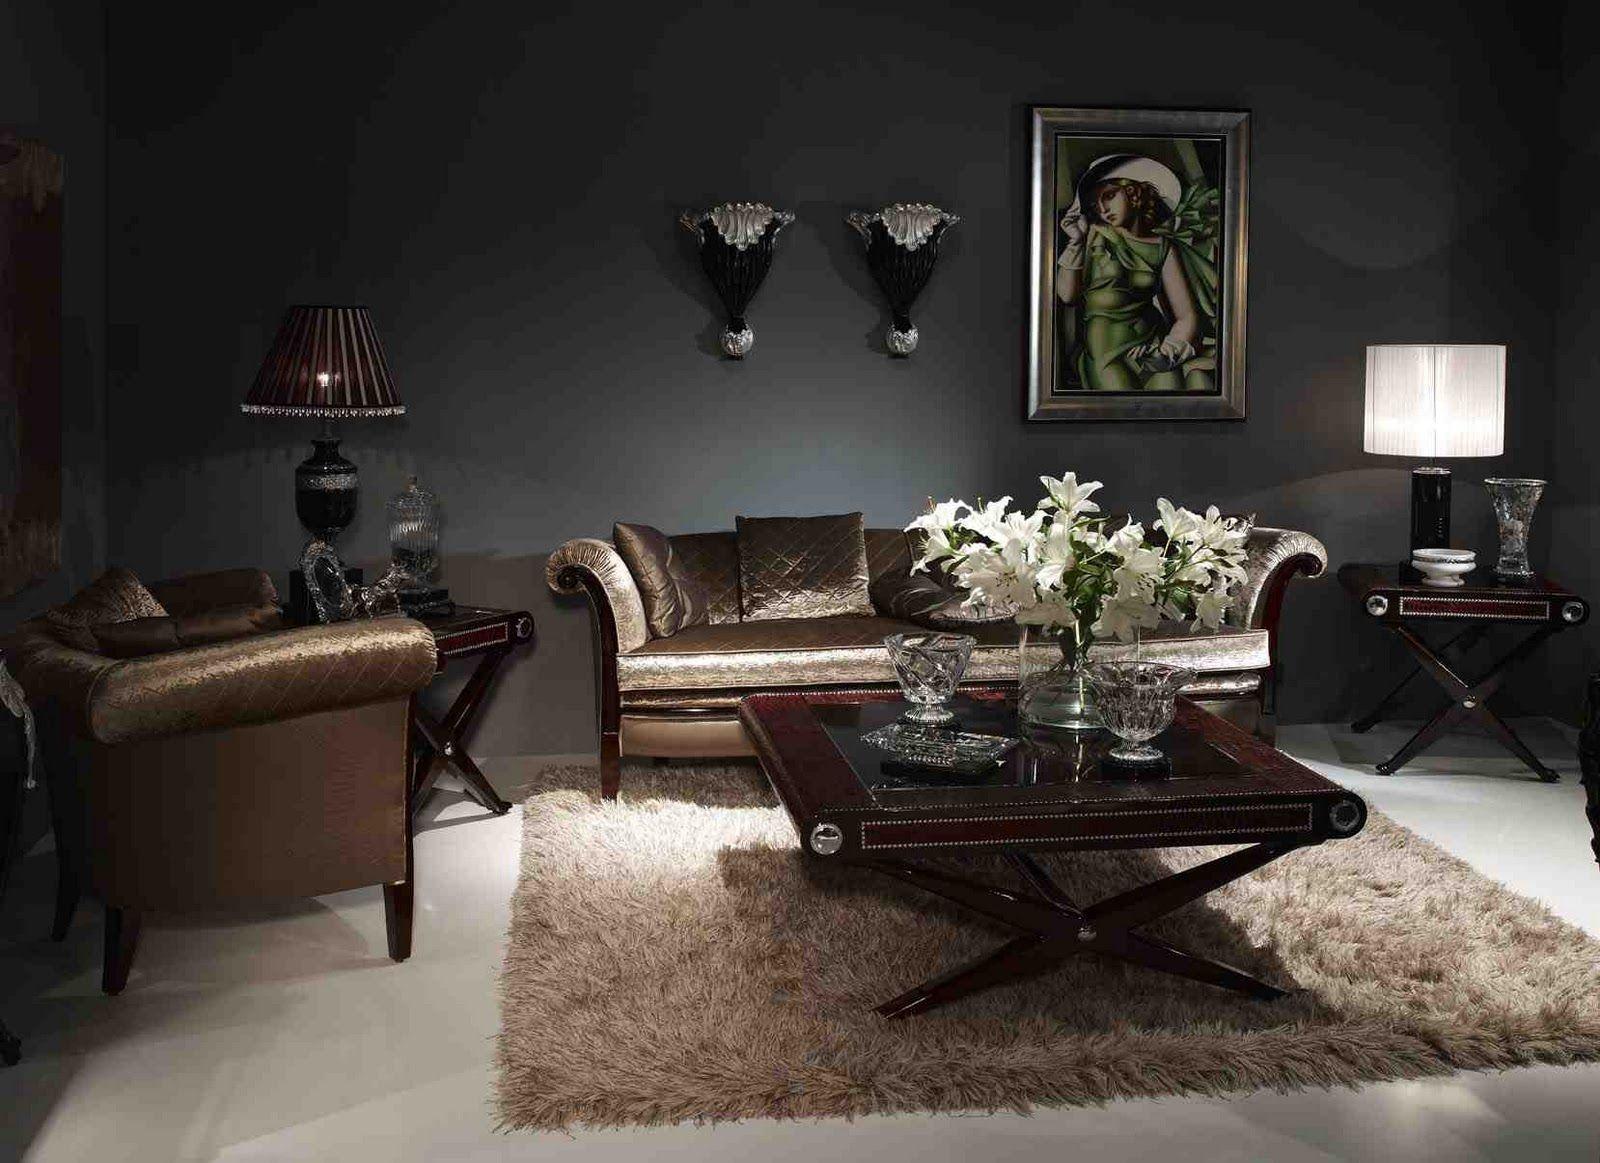 Modern Classic Furniture Reproductions Furniture Reproduction Italian Classic Furniture Furniture Design .